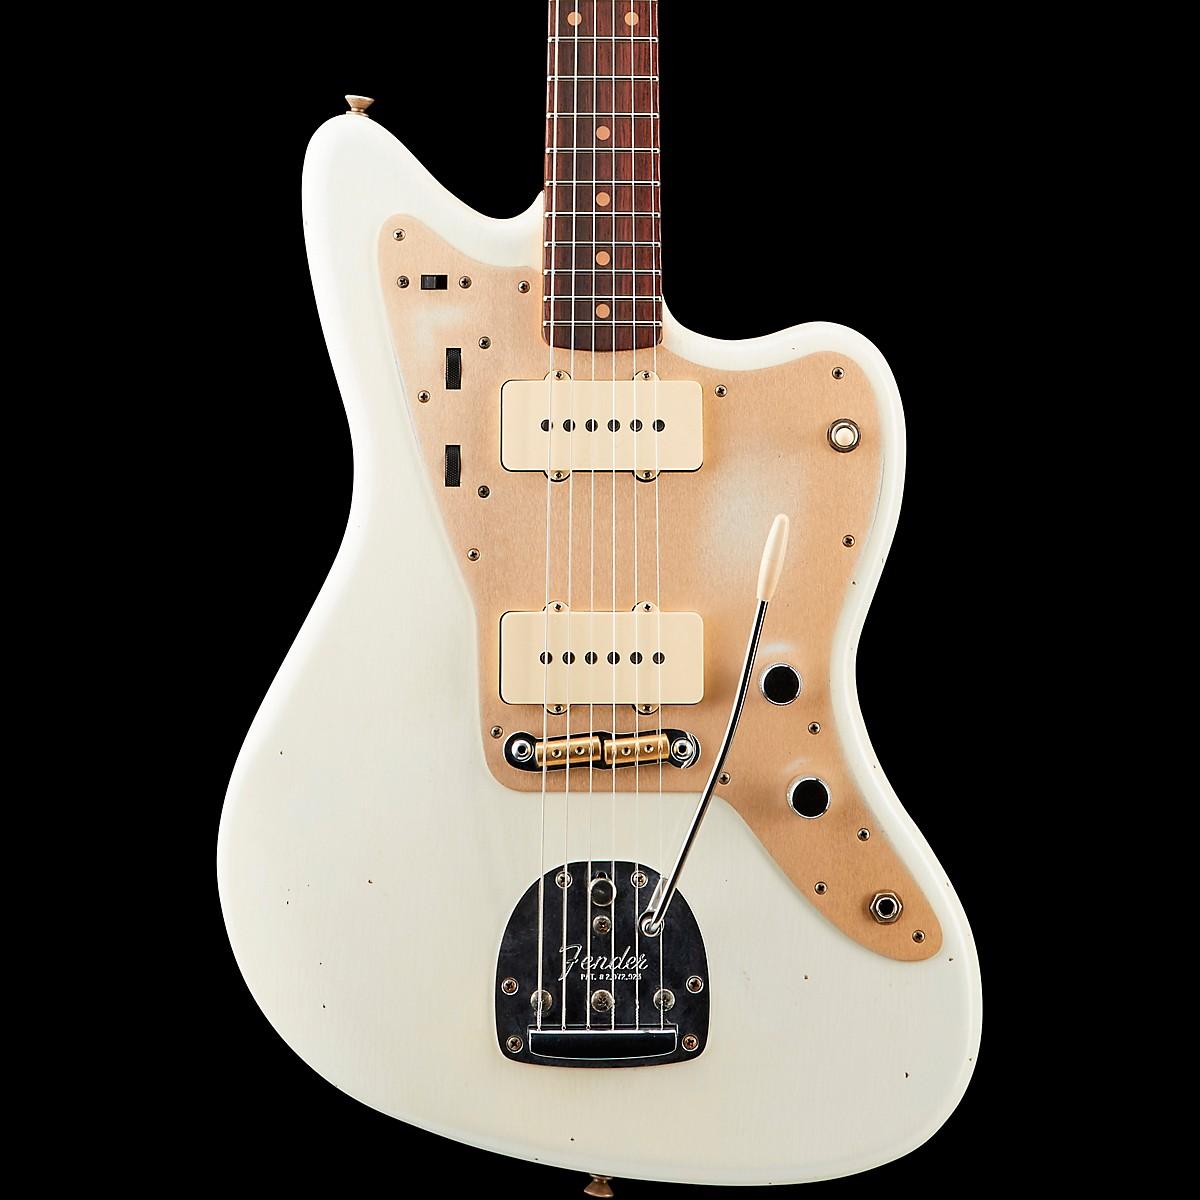 Fender Custom Shop '59 Journeyman Jazzmaster Rosewood Fingerboard Electric Guitar